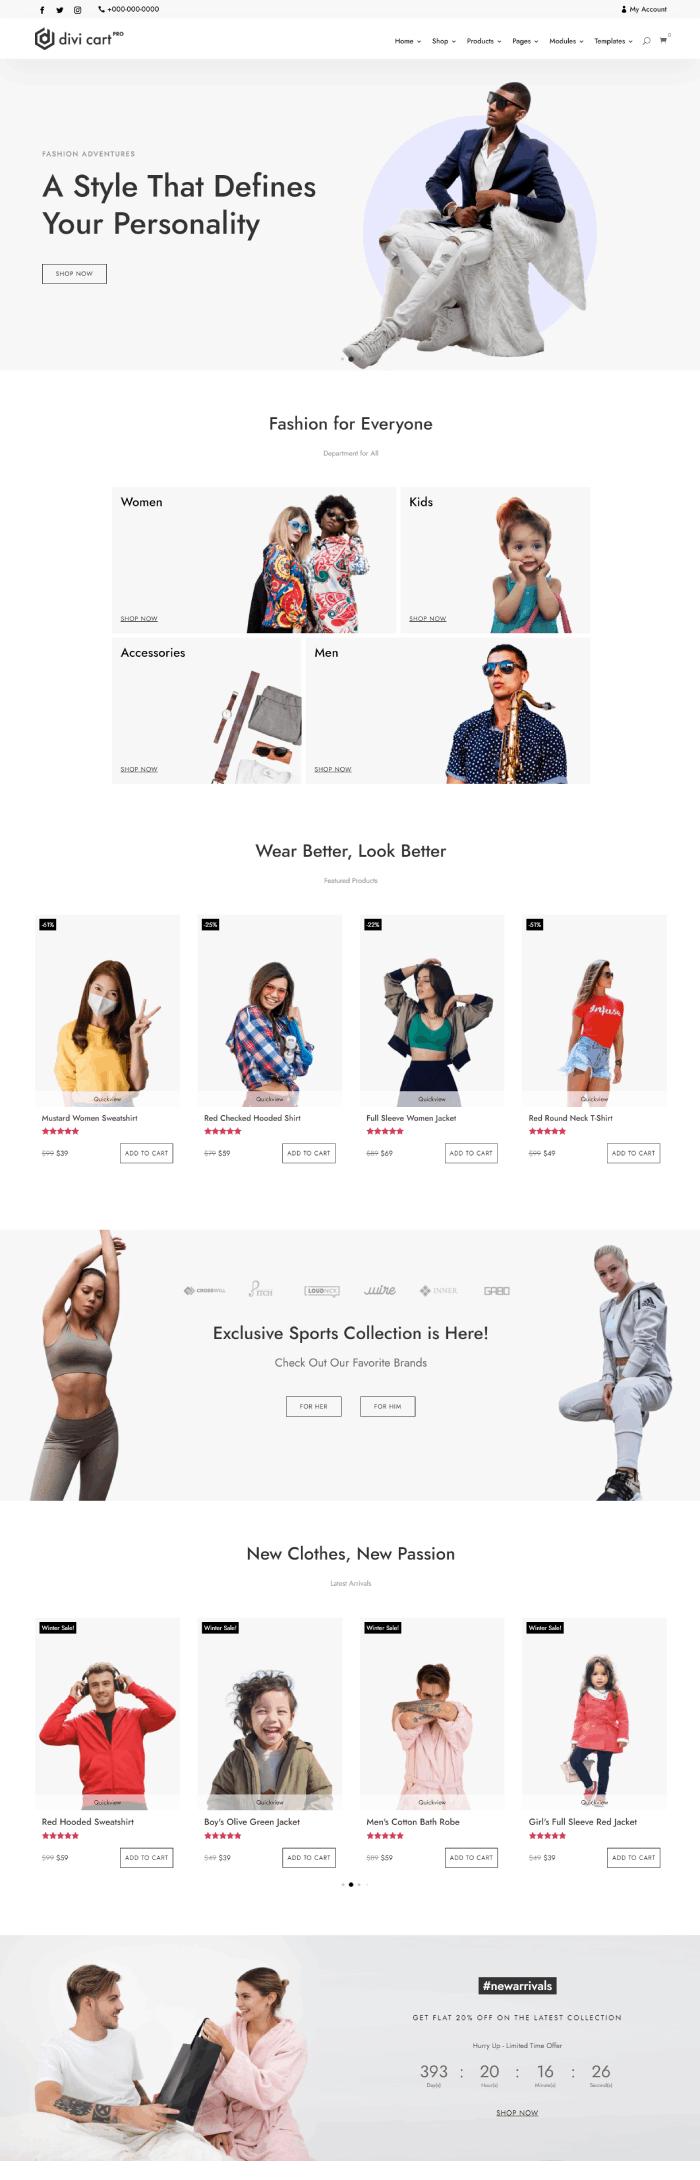 Divi Cart Pro Classic fashion homepage